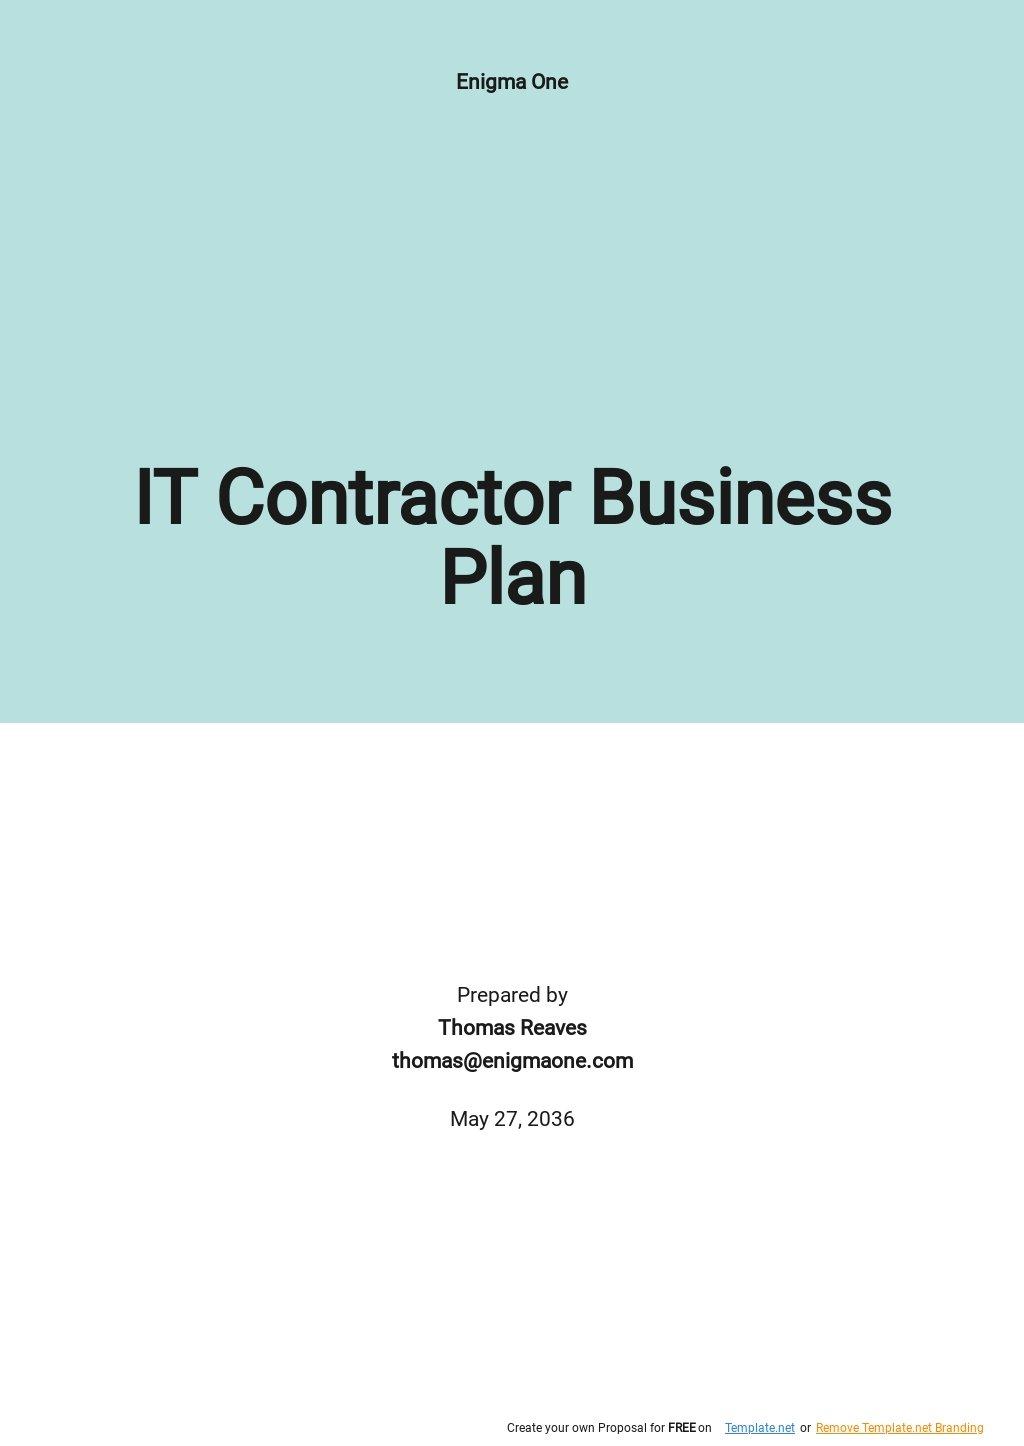 IT Contractor Business Plan Template.jpe